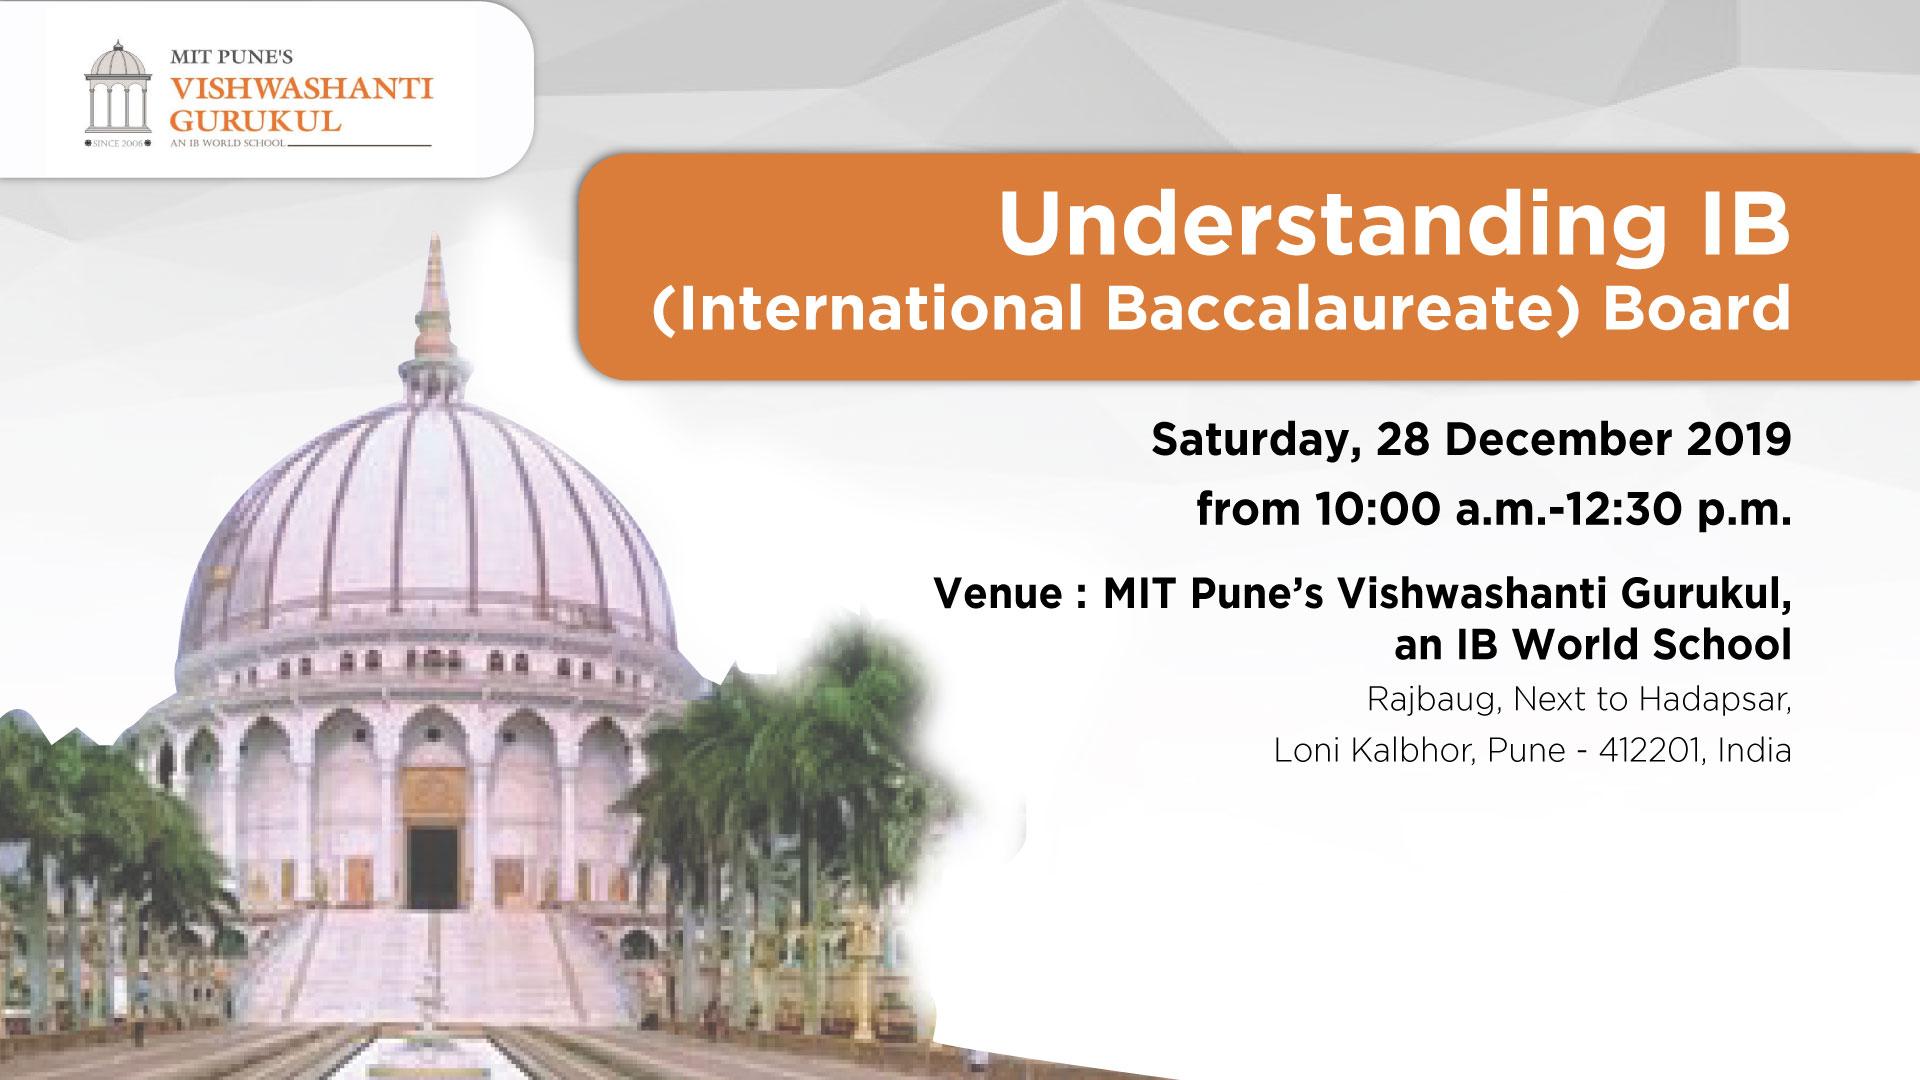 Understanding International Baccalaureate (IB) Board